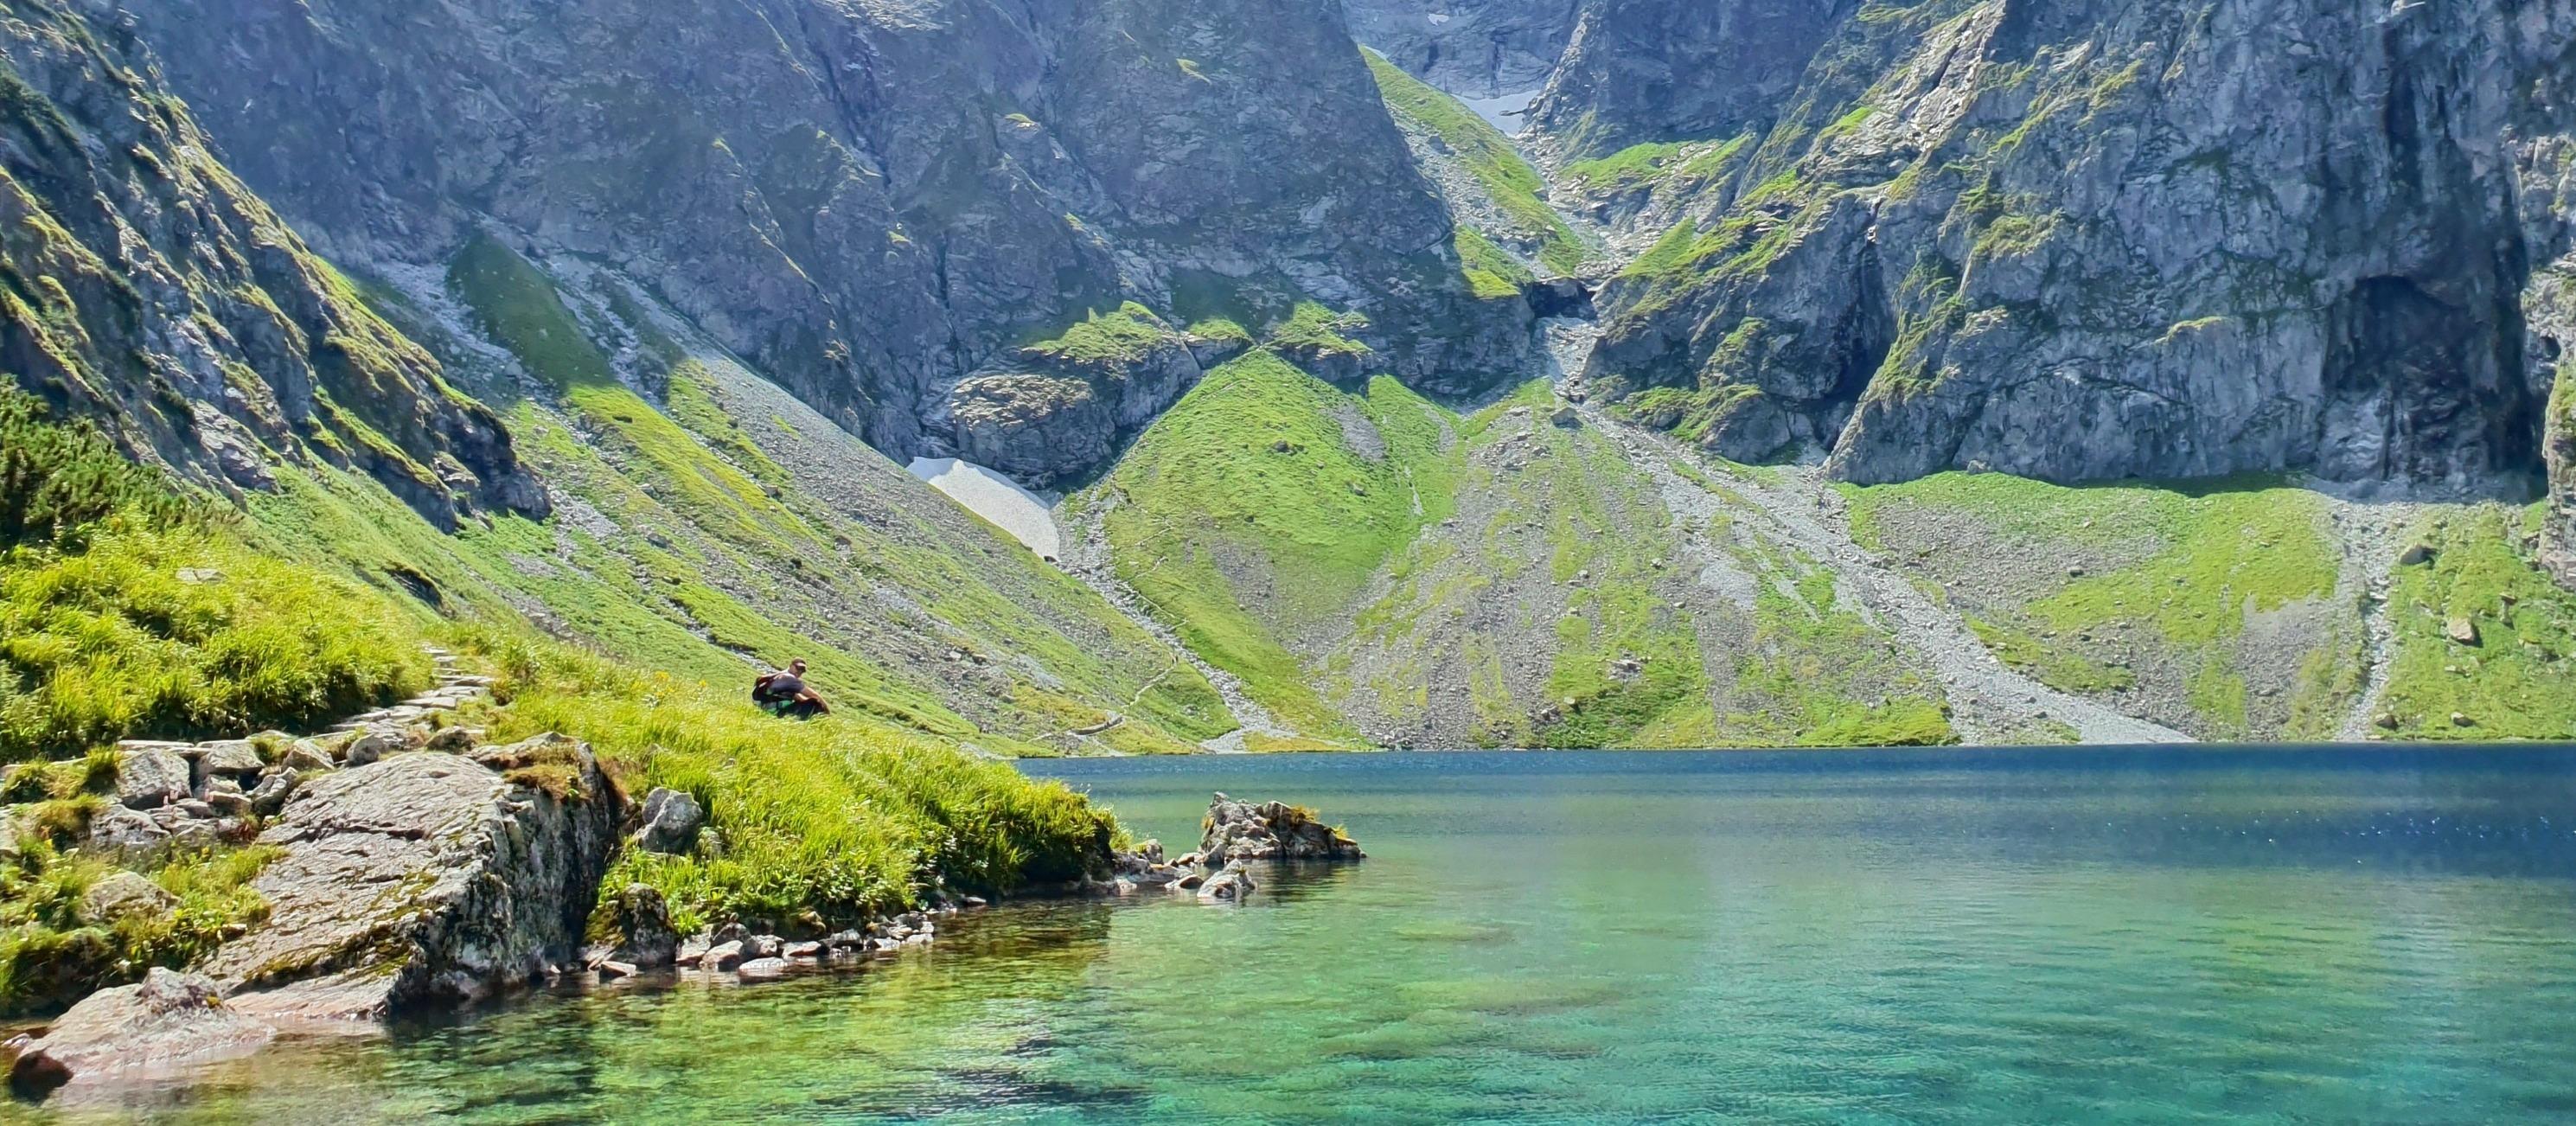 Tatra national park | הפארק הלאומי טאטרה